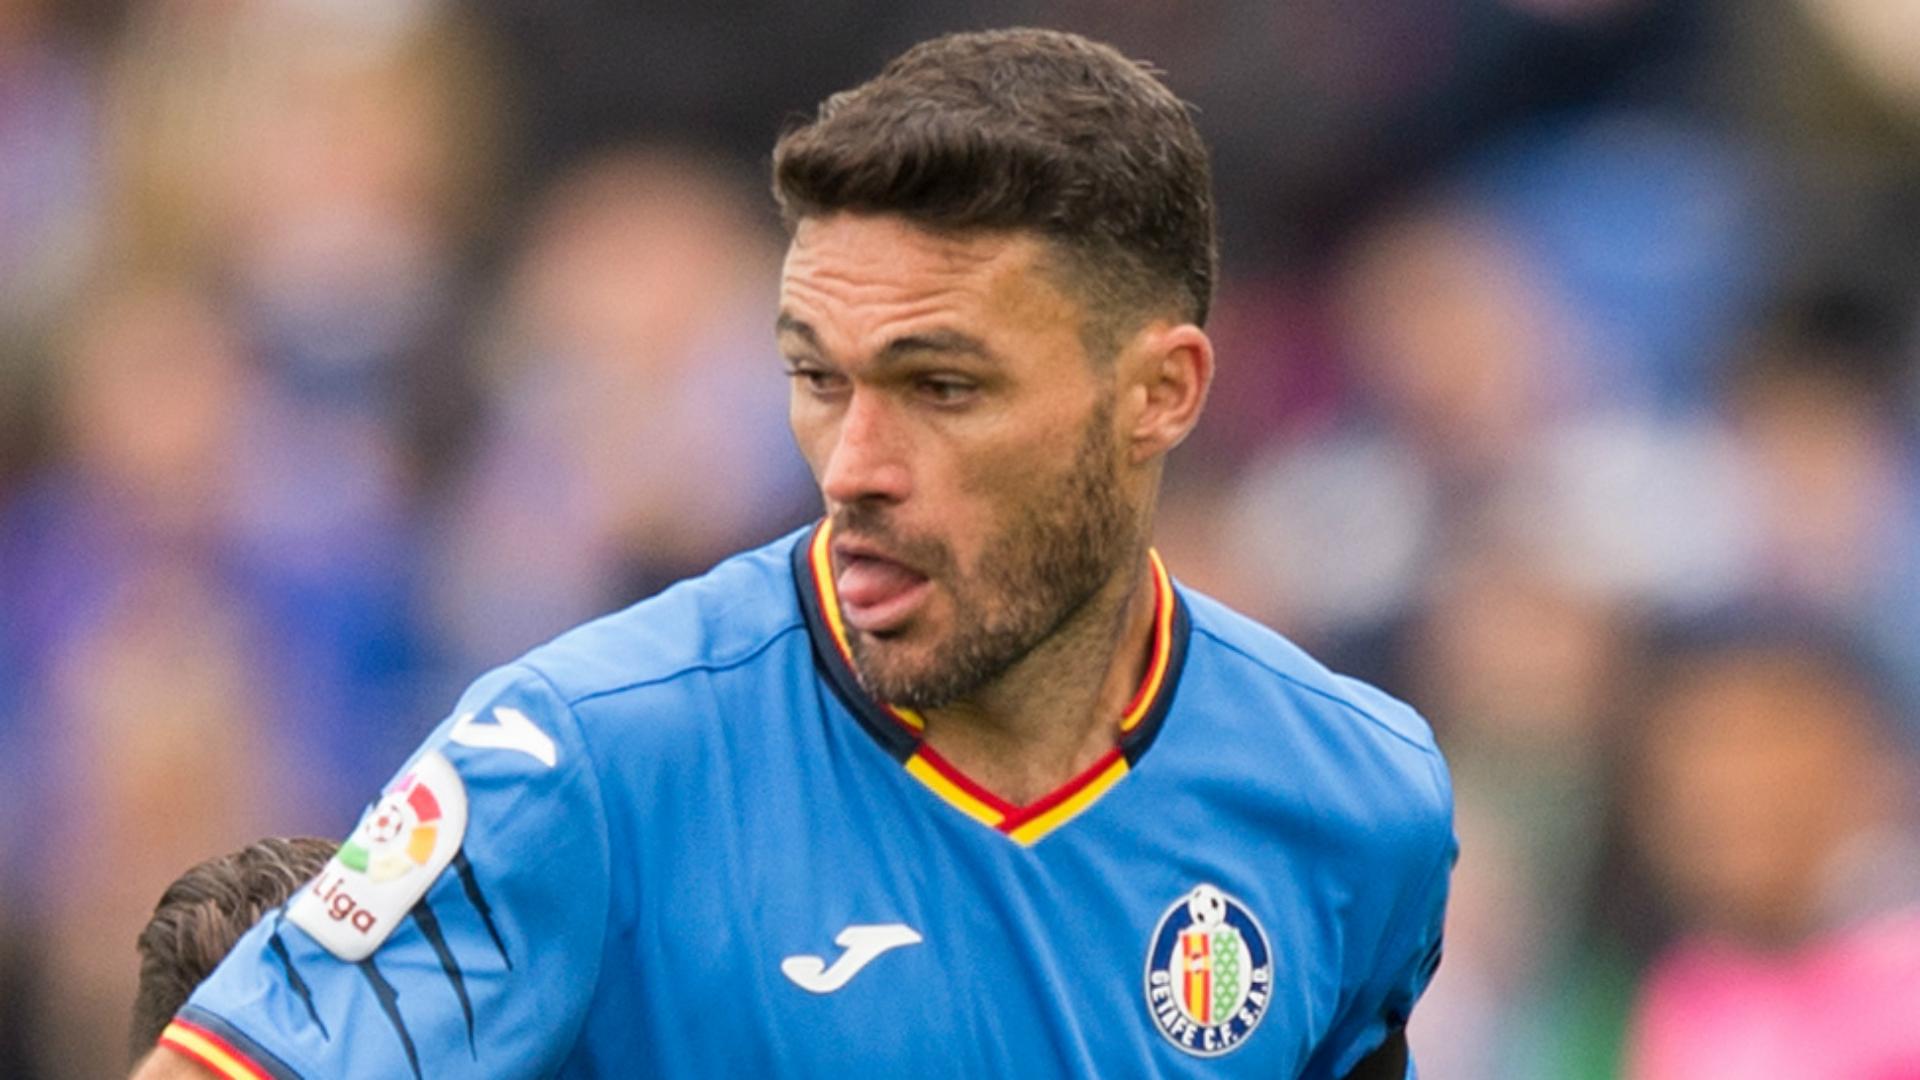 Molina set to play past 40! Spanish striker swaps LaLiga clubs